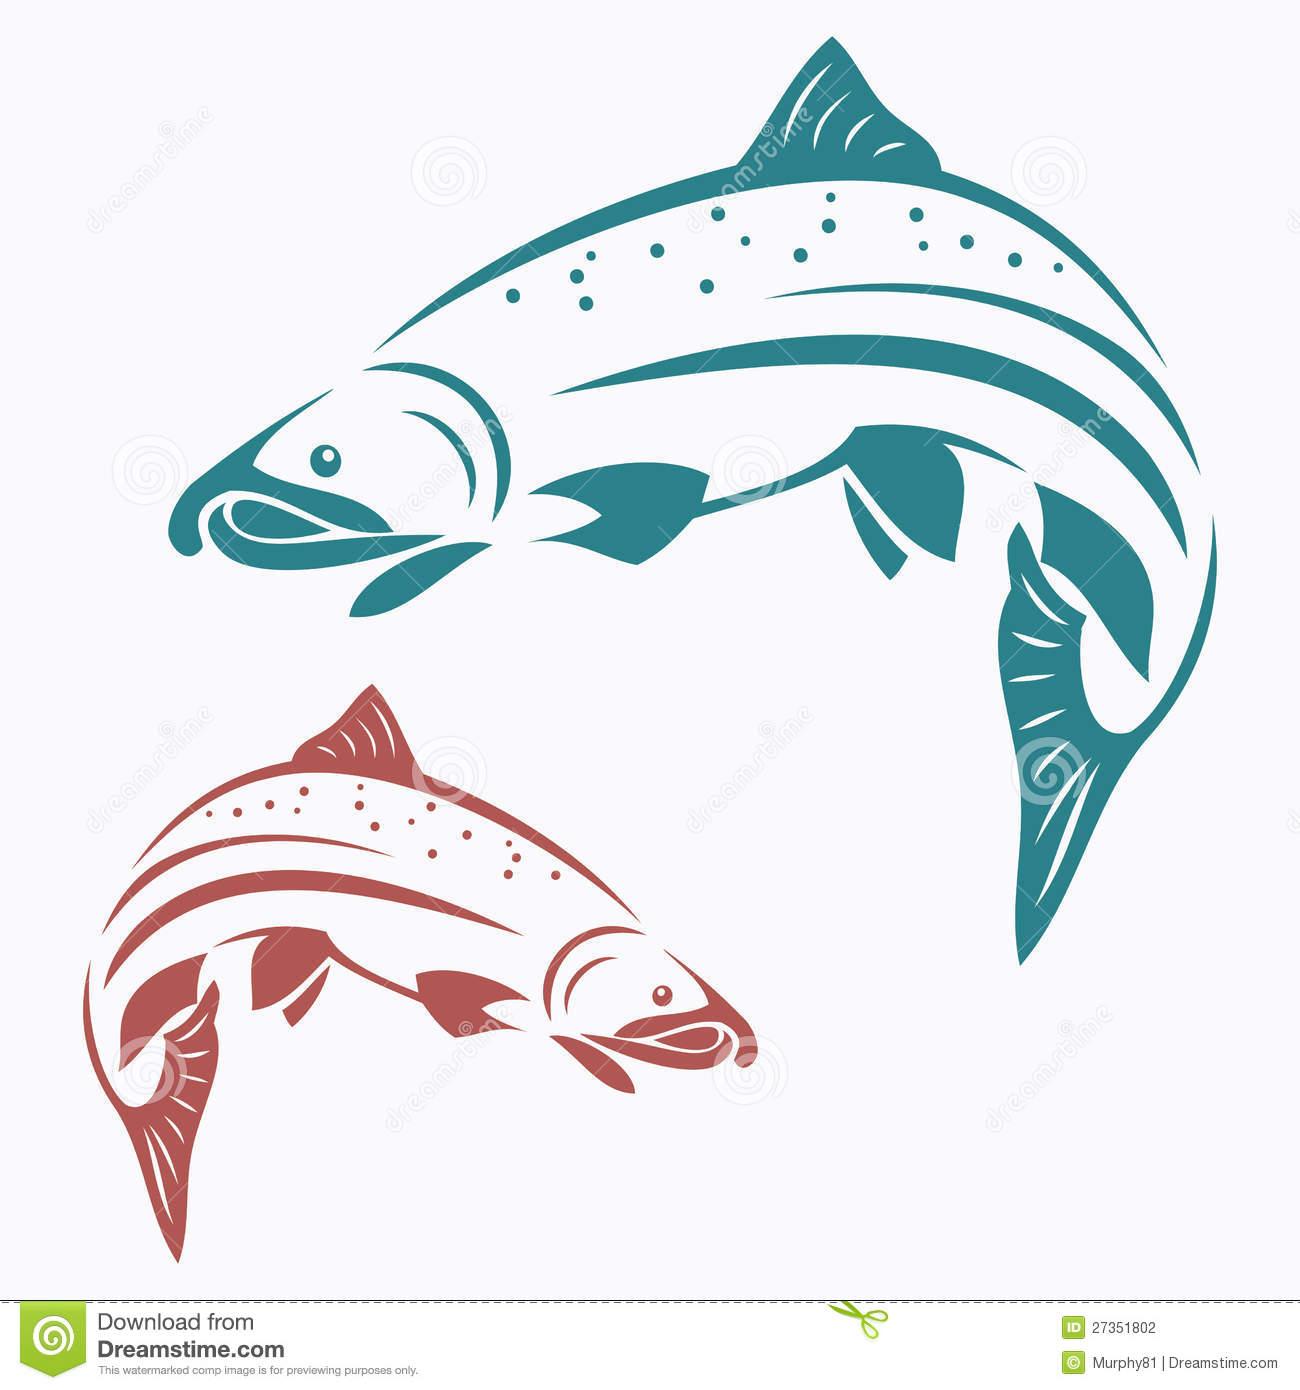 Salmon clip art.